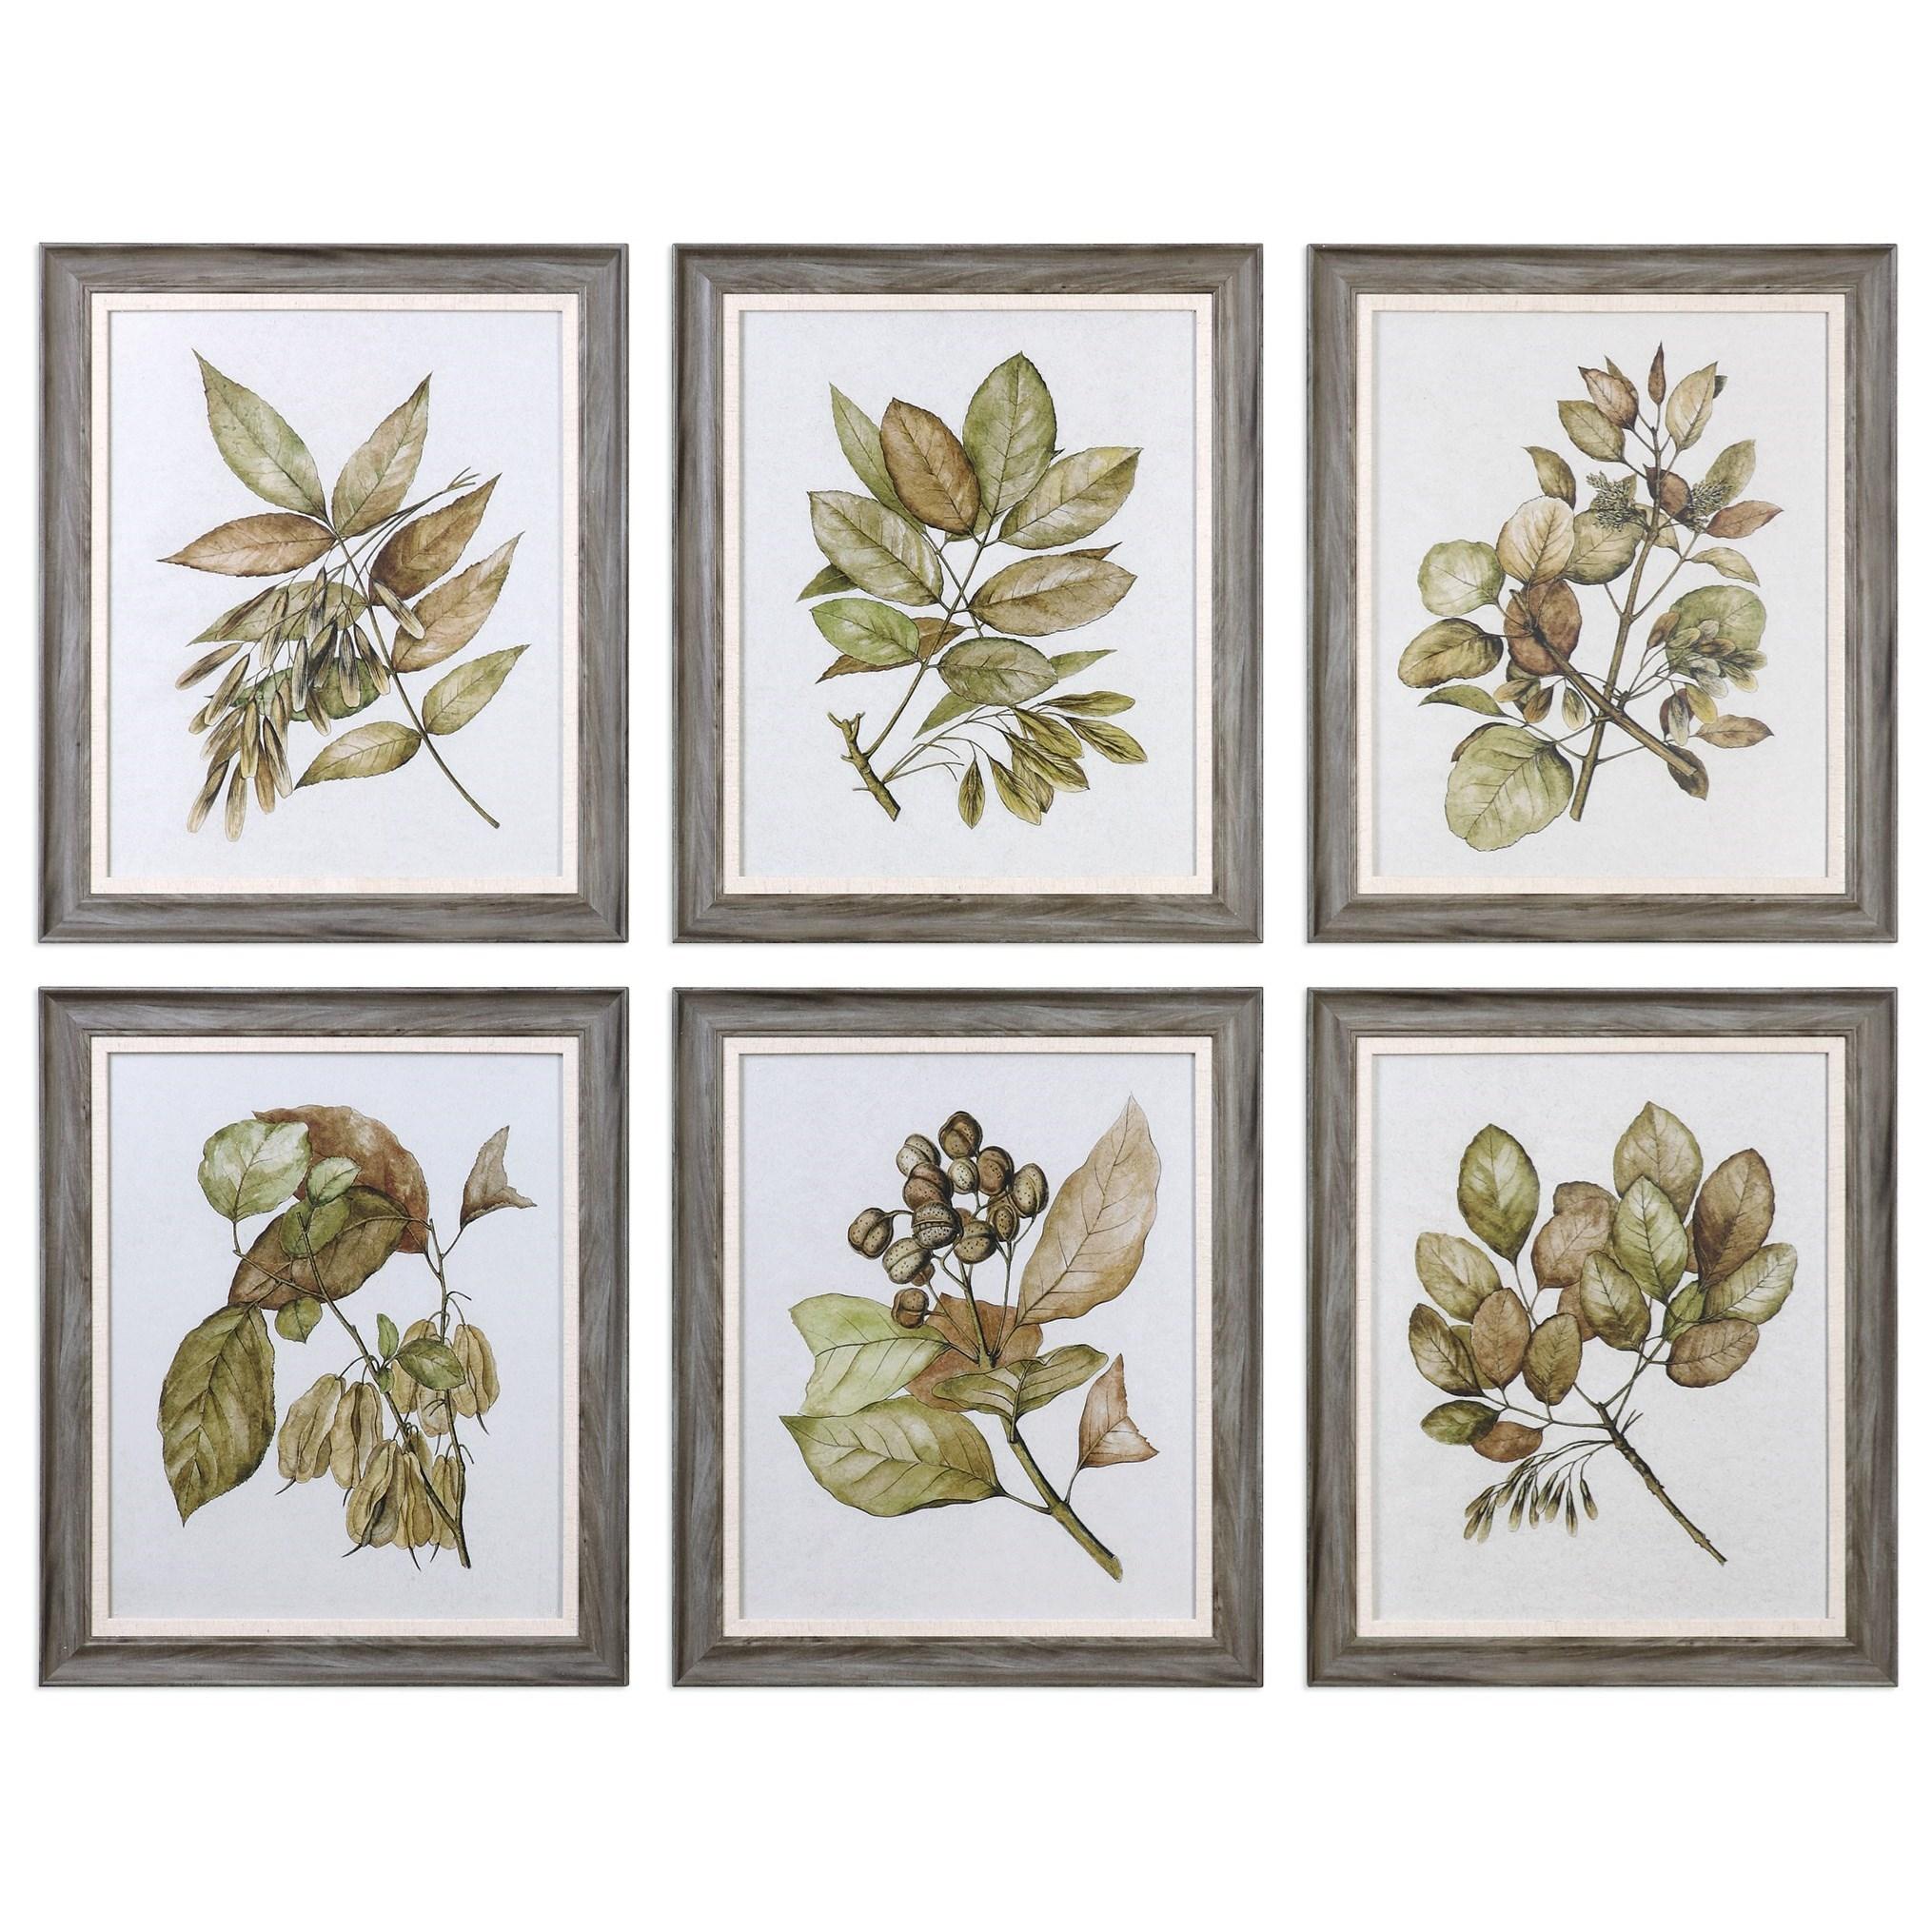 Uttermost Art Seedlings(Set of 6) - Item Number: 33643